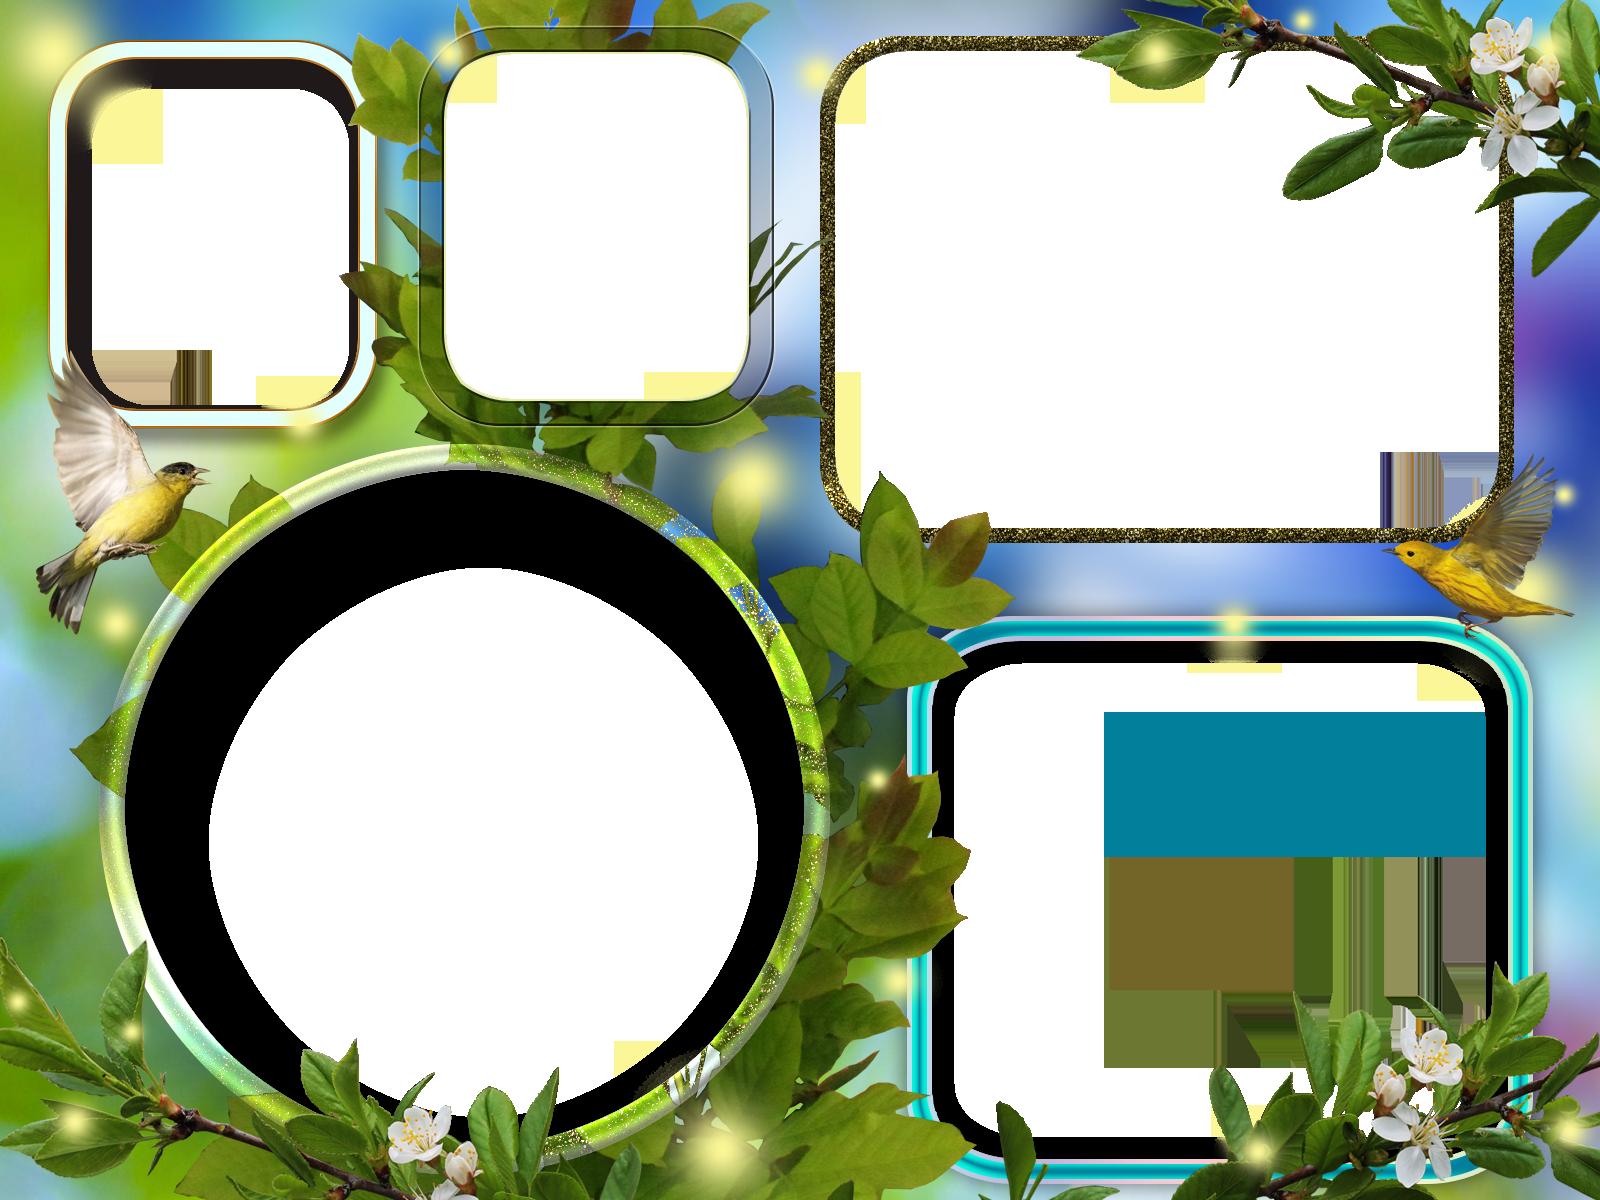 Фотоколлаж шаблоны для множества фото